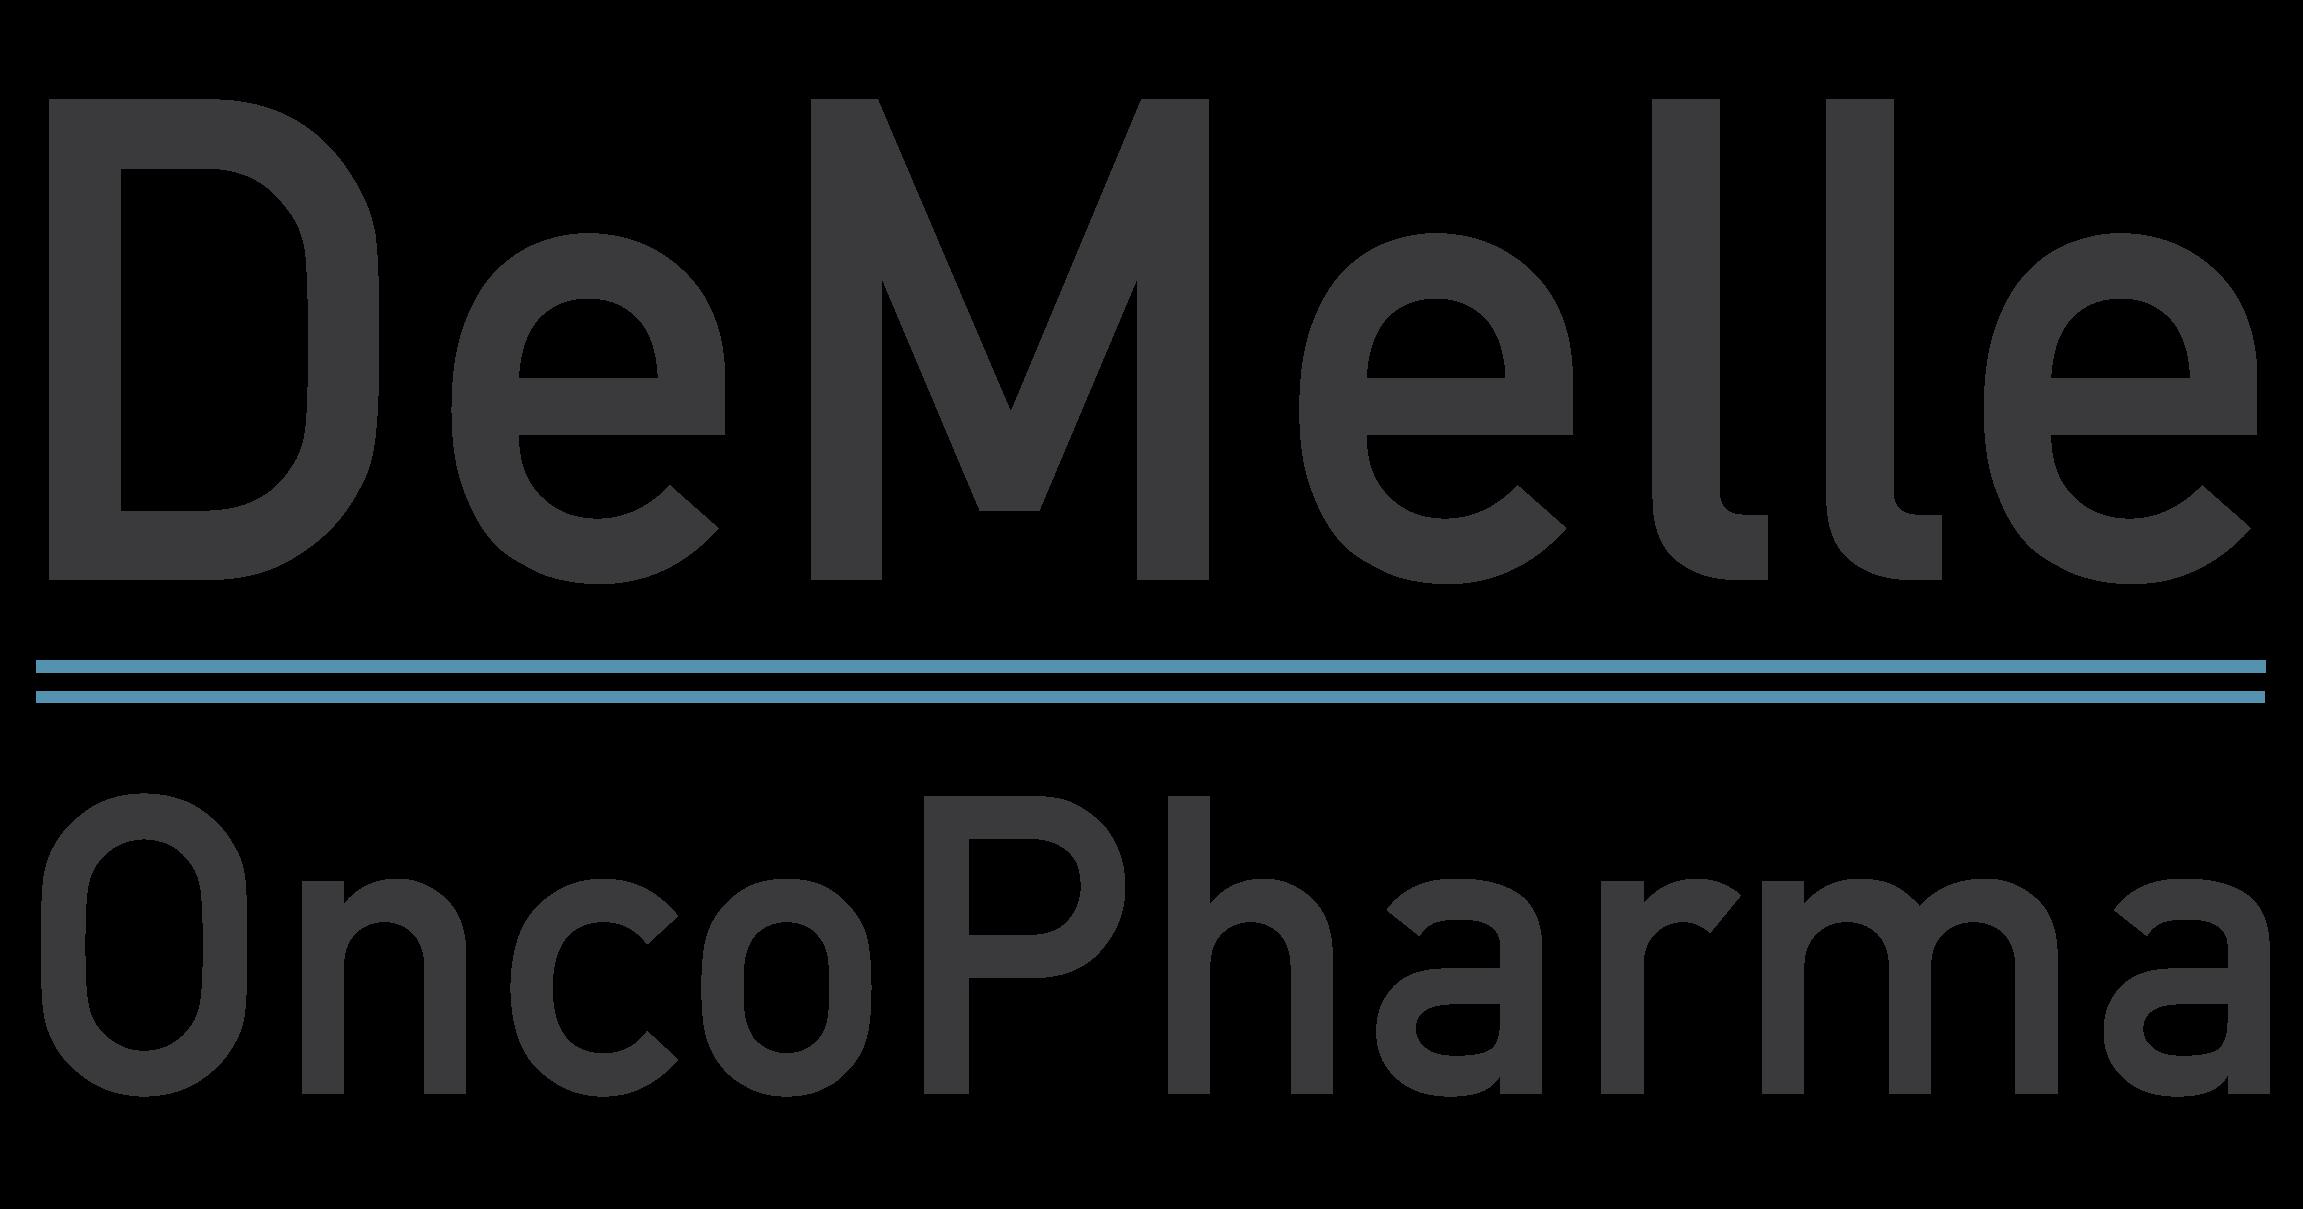 DeMelle OncoPharma, LLC